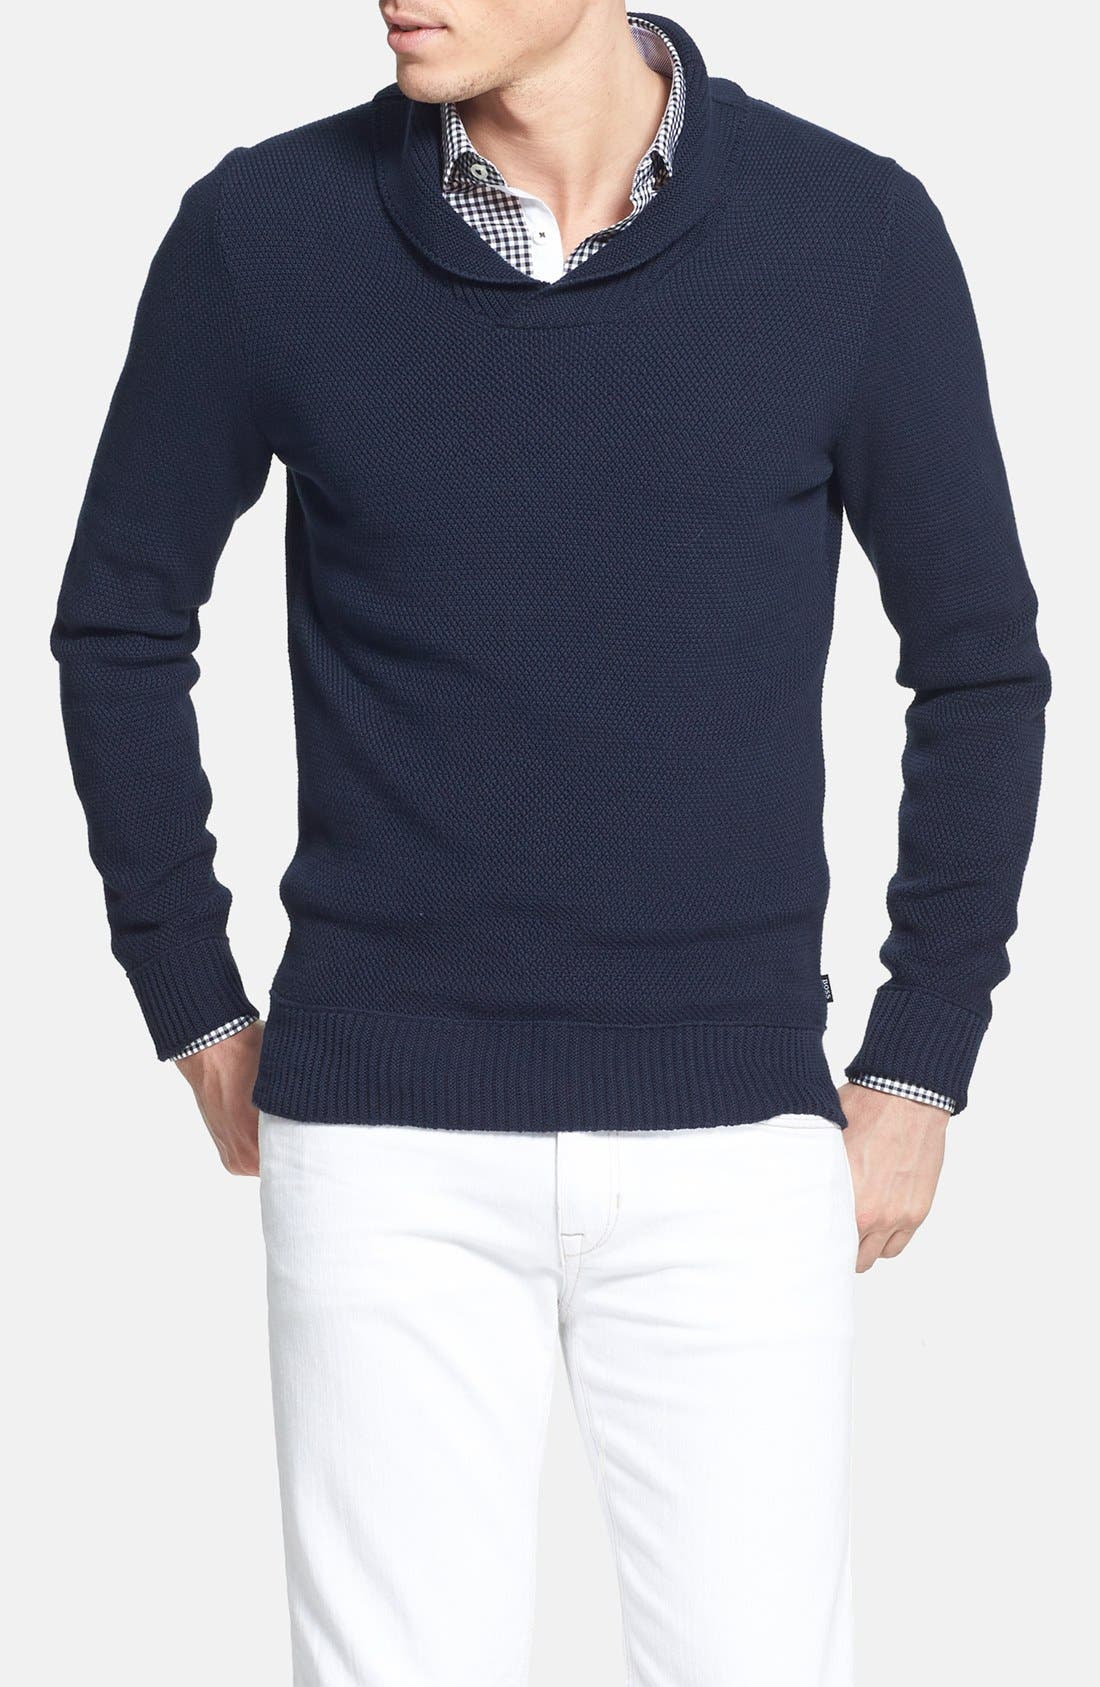 Alternate Image 1 Selected - BOSS HUGO BOSS 'Pivot' Slim Fit Shawl Collar Sweater